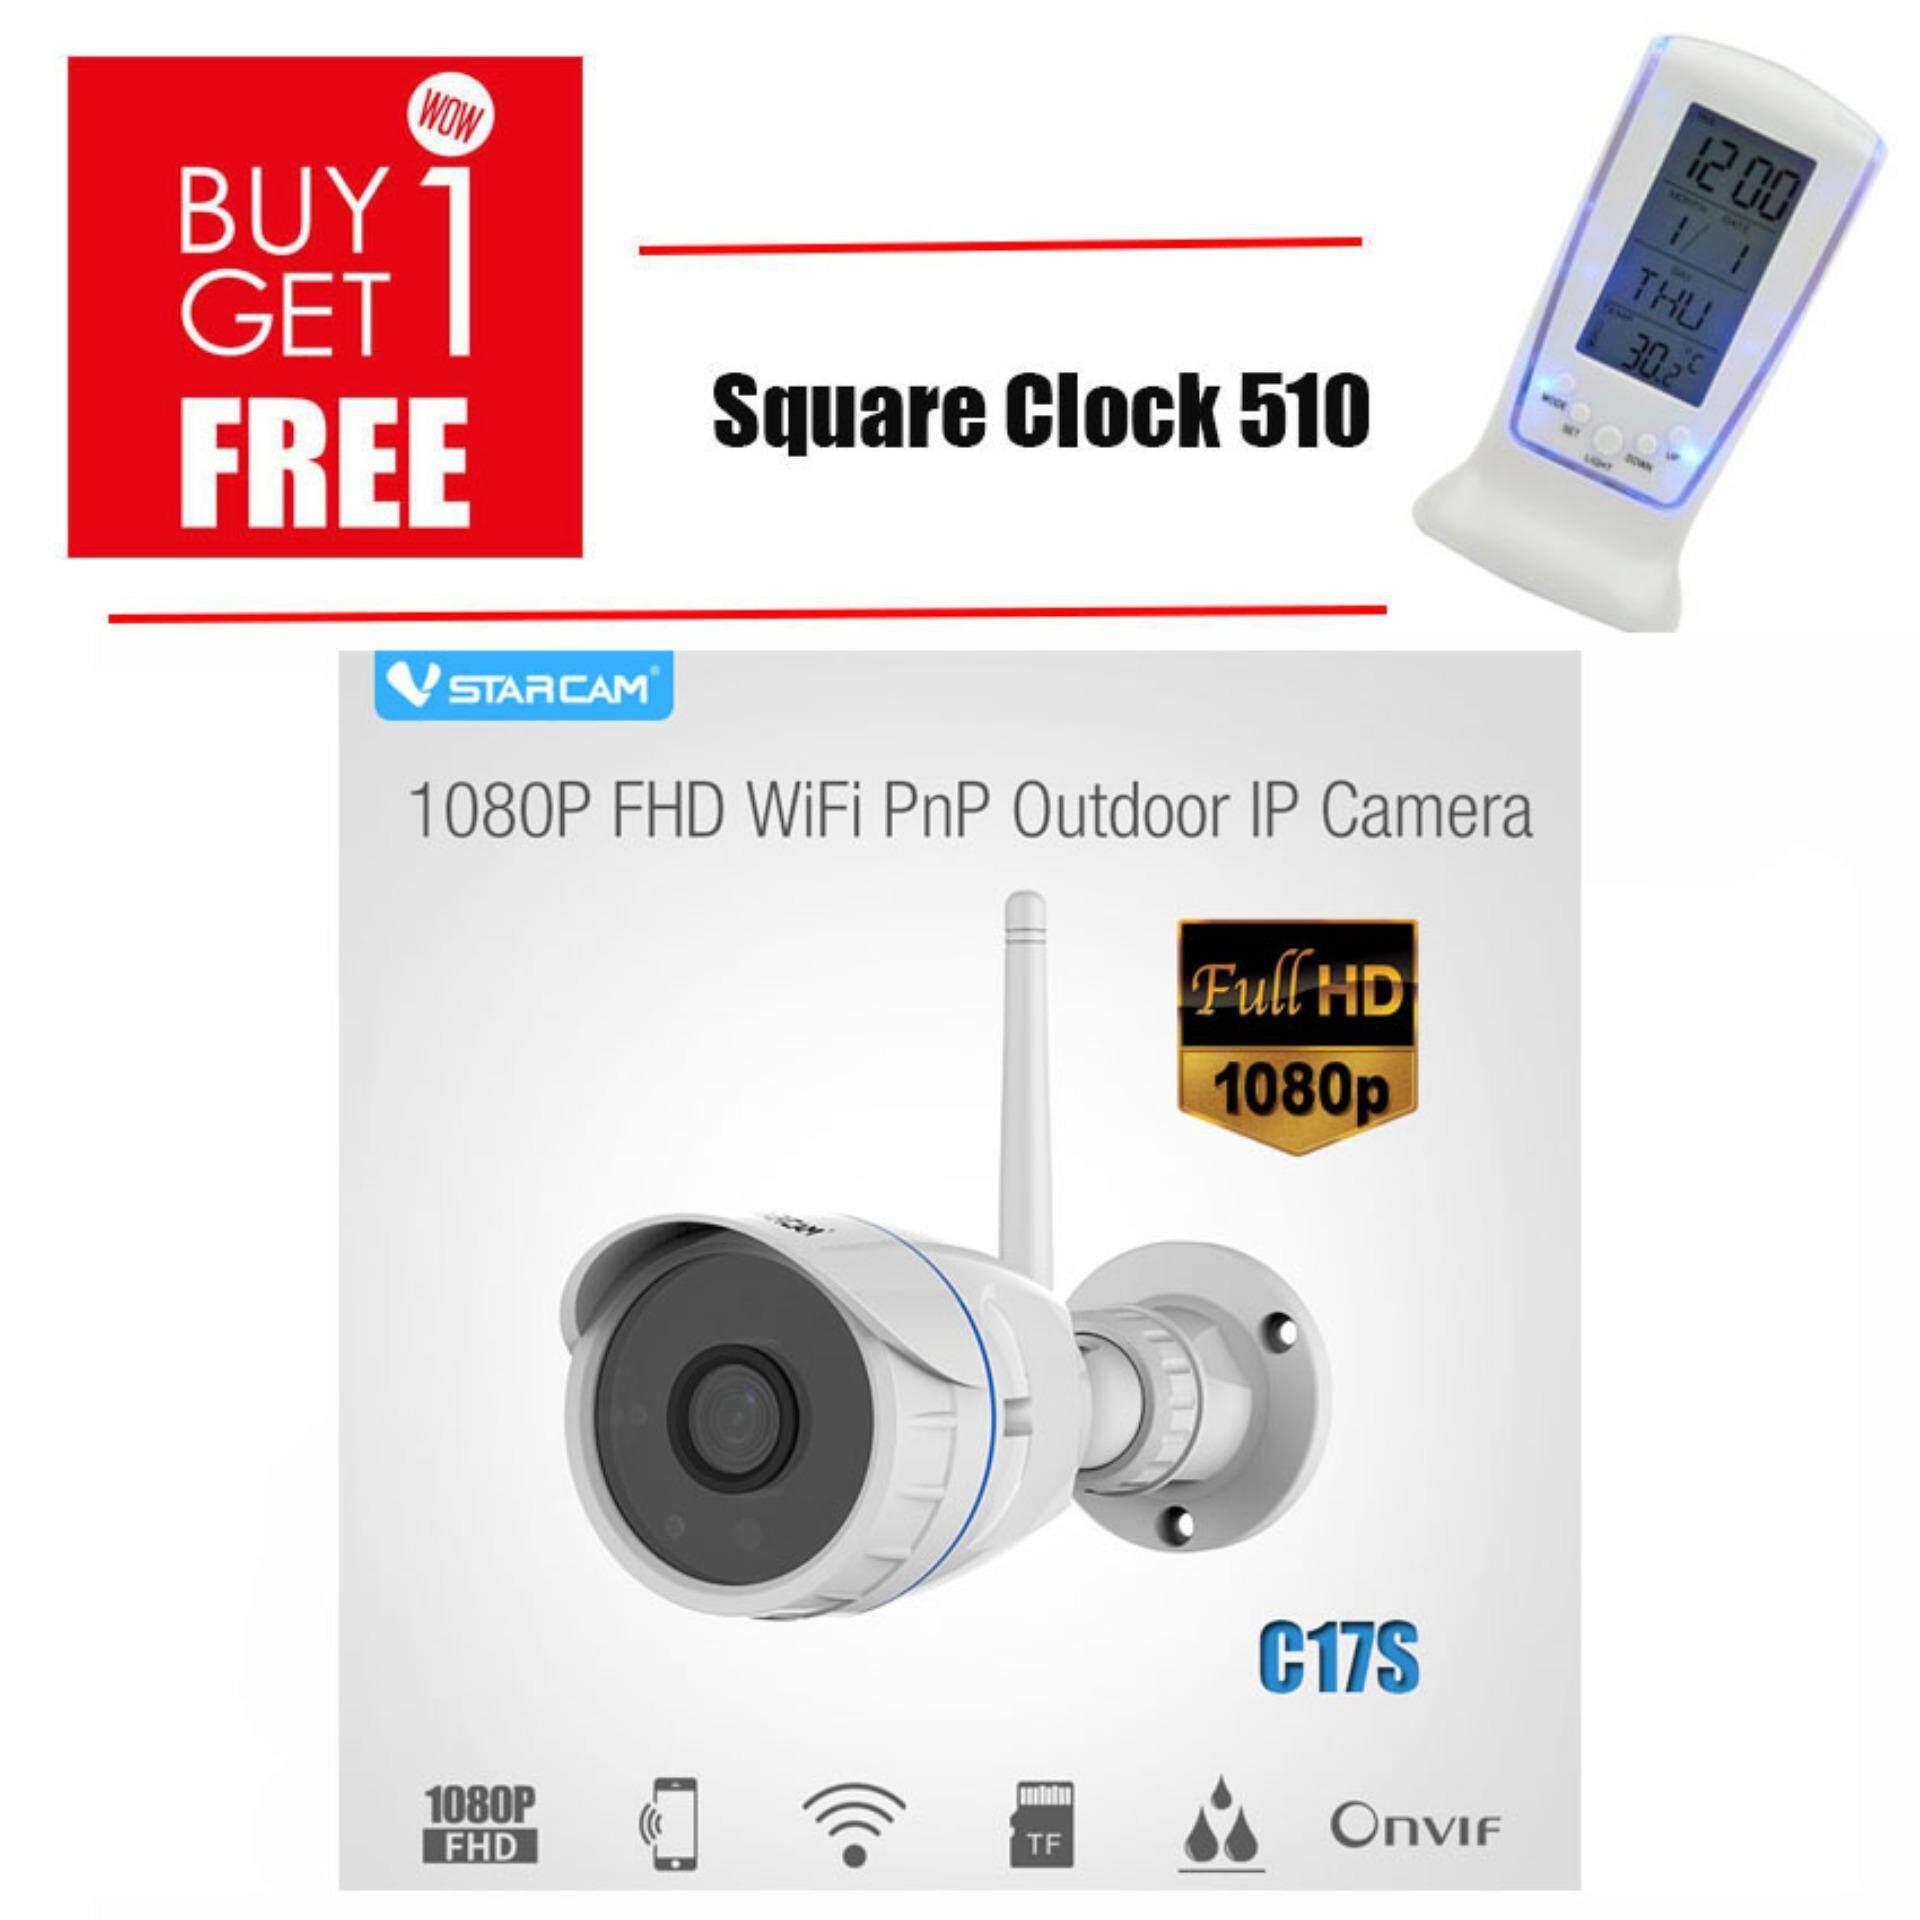 VStarcam C17S 1080P Outdoor IP Camera กล้องวงจรปิดไร้สาย ภายนอก กันน้ำ 2.0ล้านพิกเซล – White แถมฟรี Square Clock 510